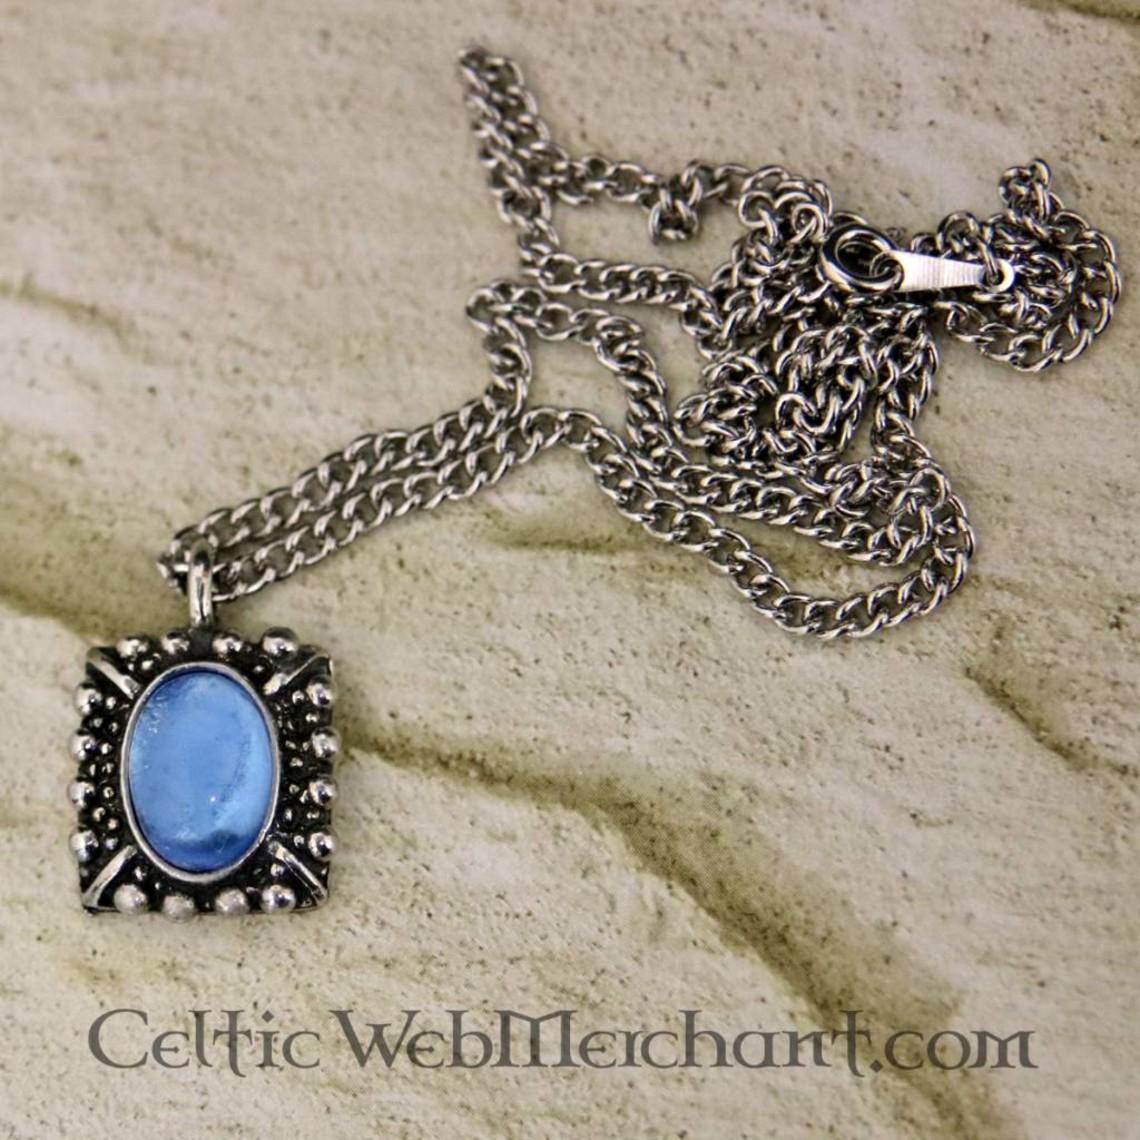 Tudorketting Elizabeth I, blauwe edelsteen, zilver